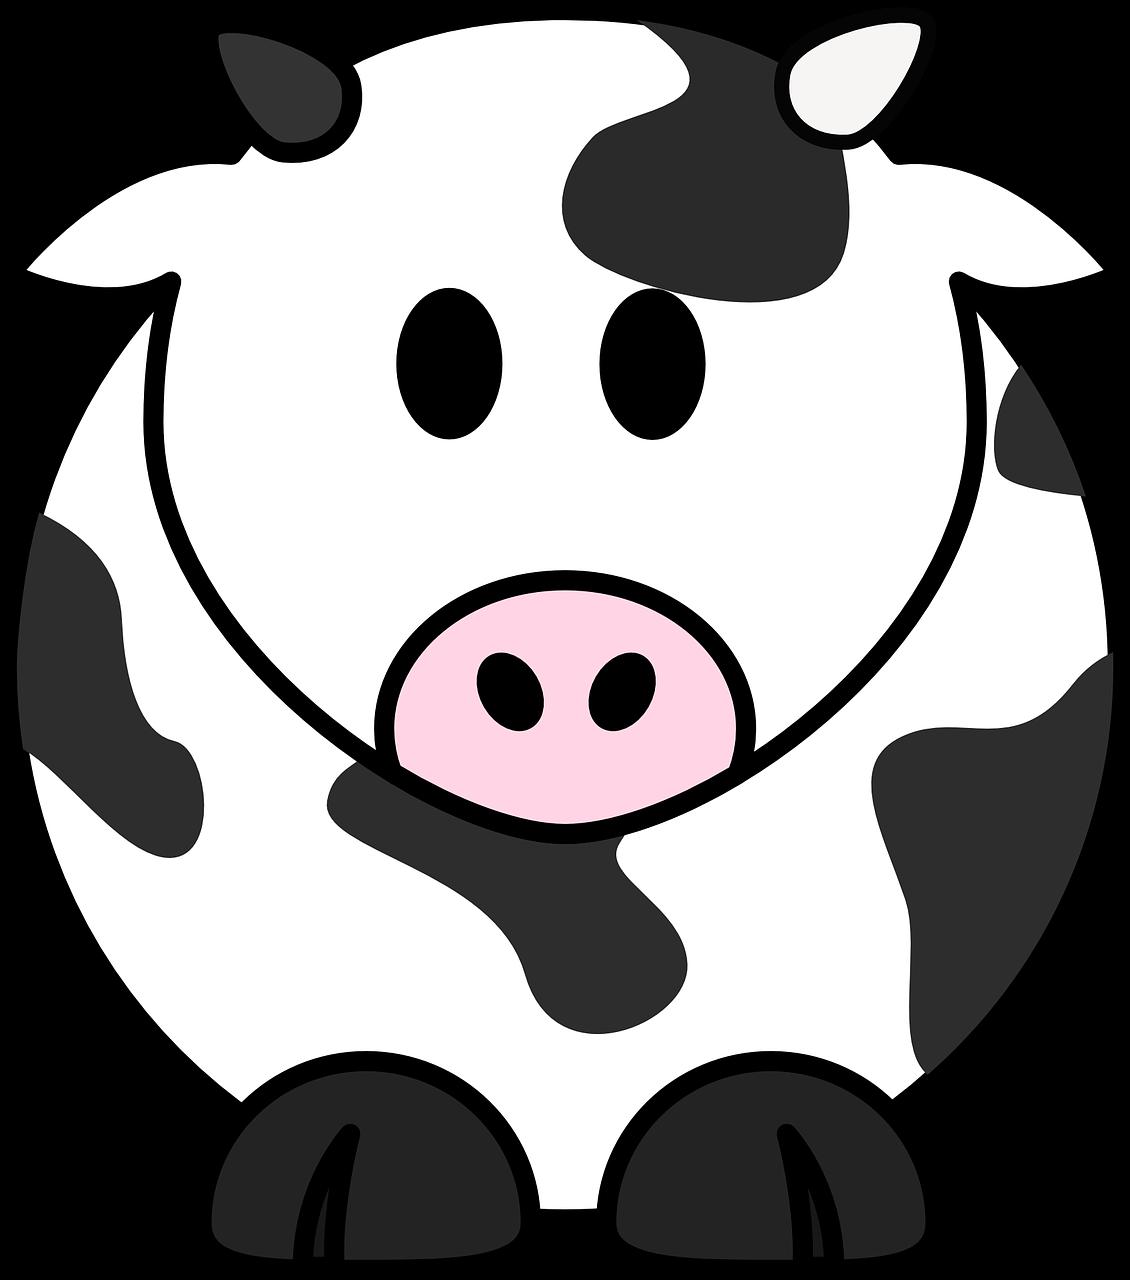 Wheat clipart cute cartoon. Free image on pixabay